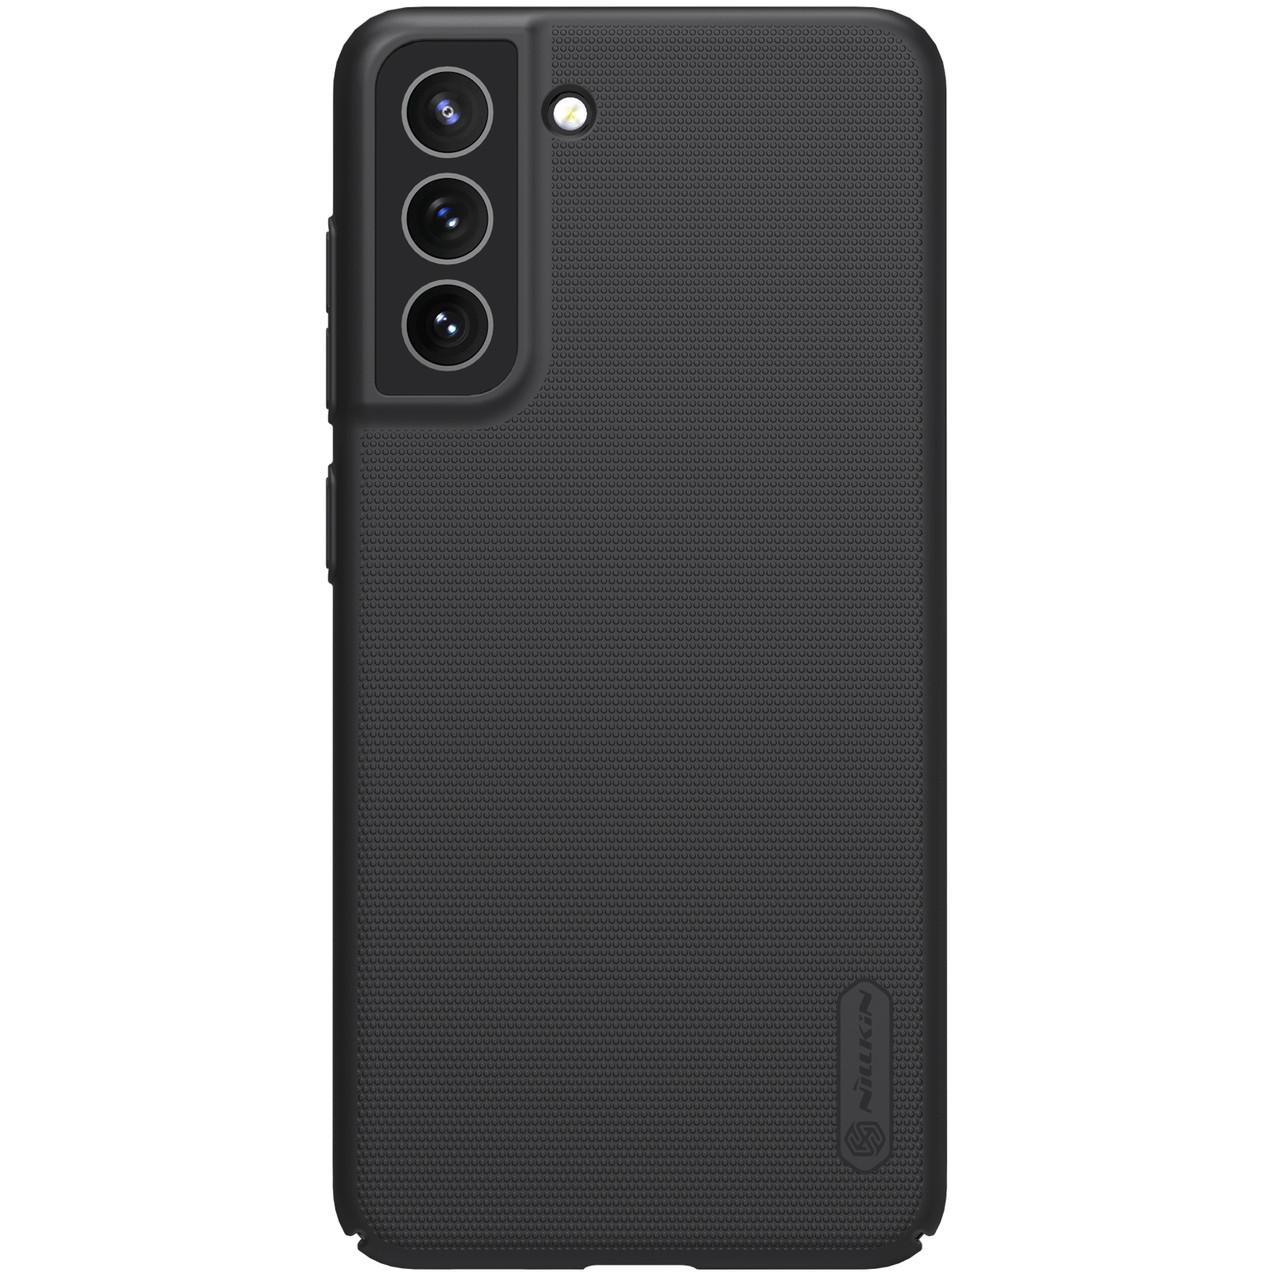 Захисний чохол Nillkin для Samsung Galaxy S21 FE 2021 Super Frosted Shield Black Чорний